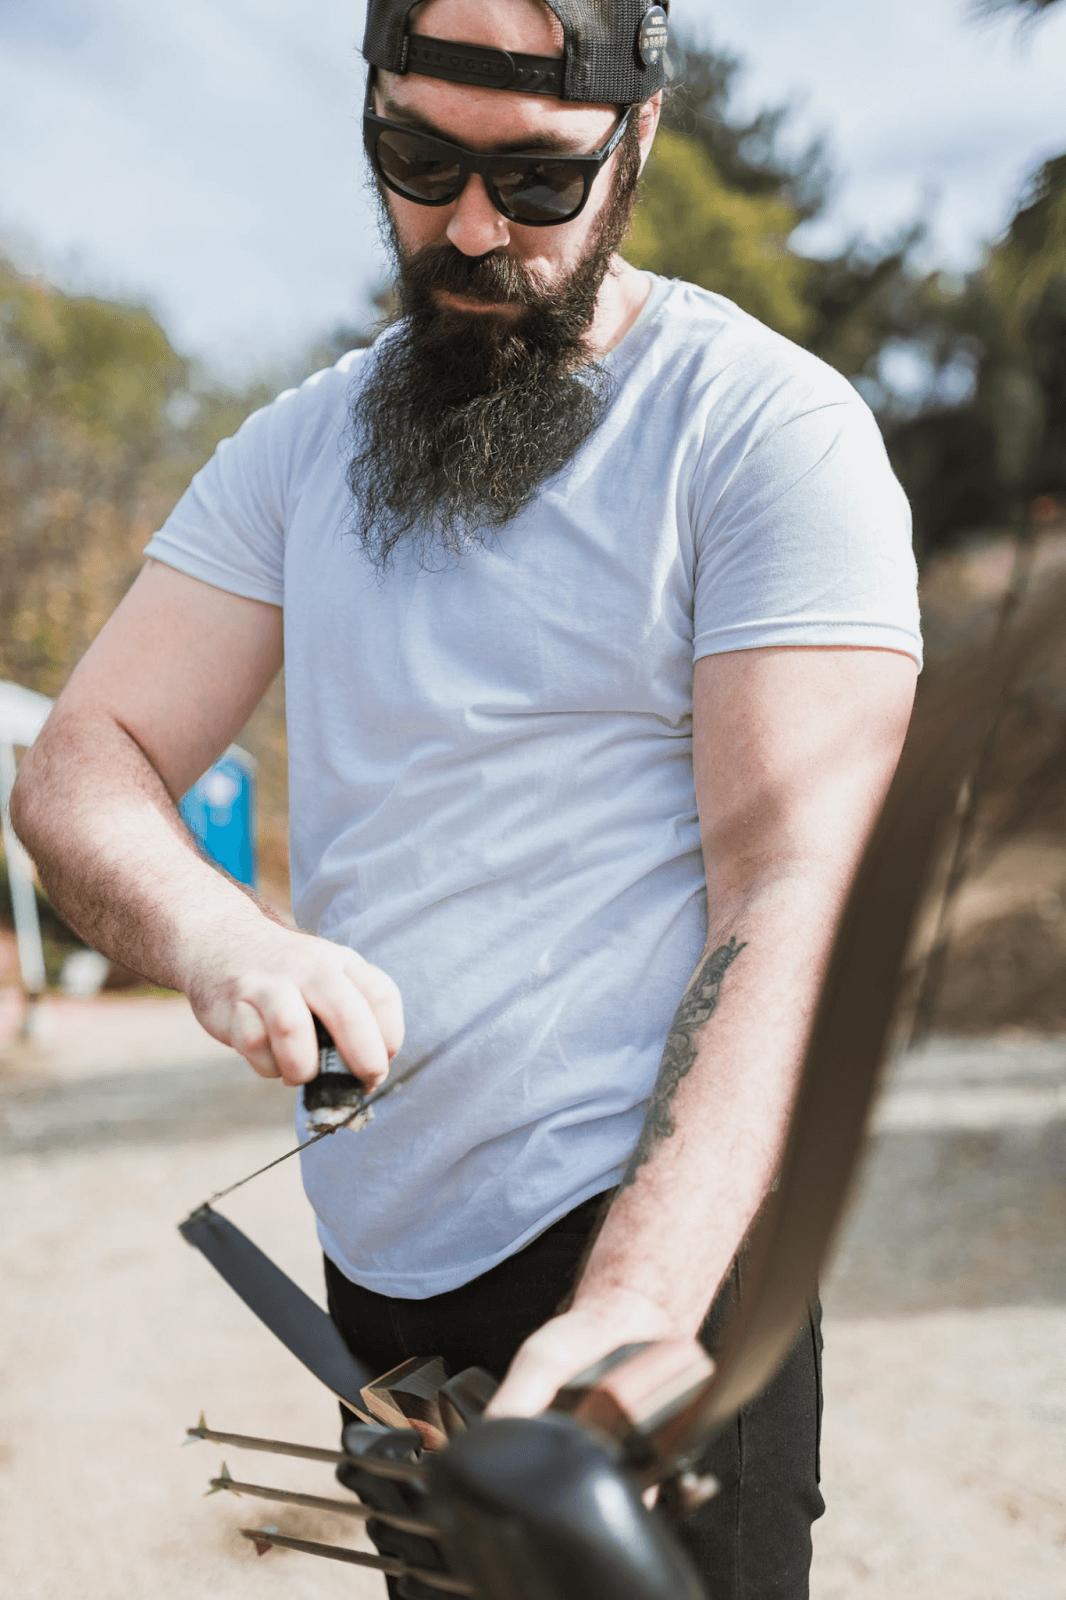 Man with an archery bow